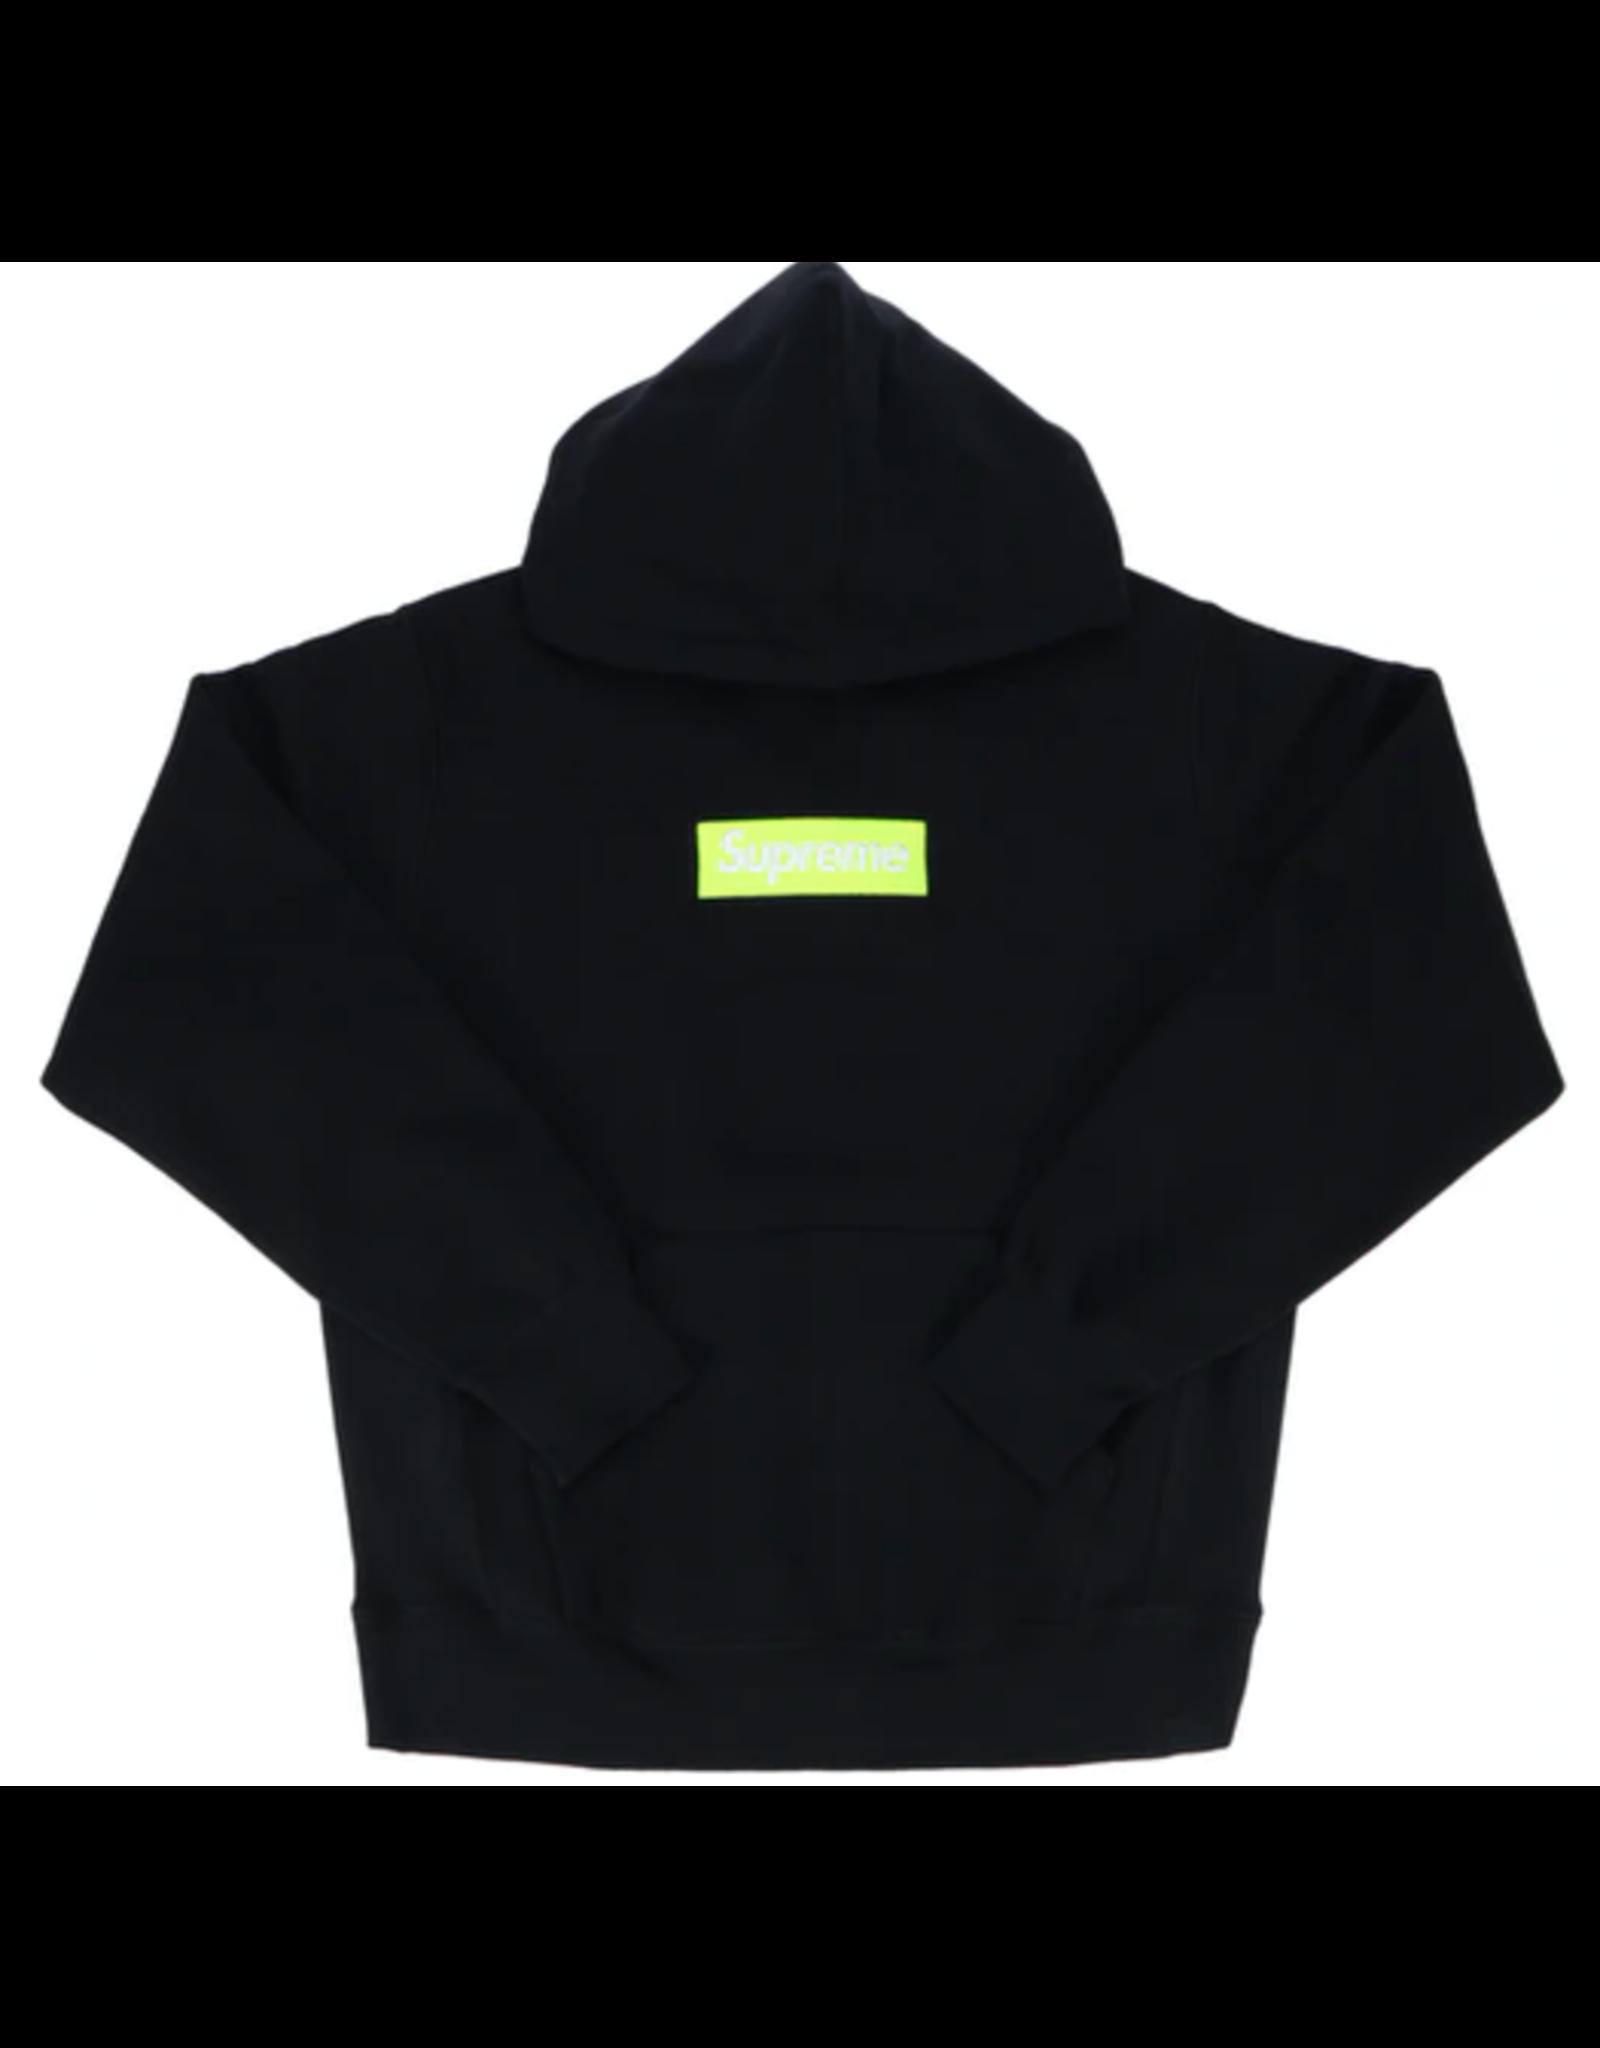 SUPREME Supreme Box Logo Hooded Sweatshirt (FW17) Black - XL